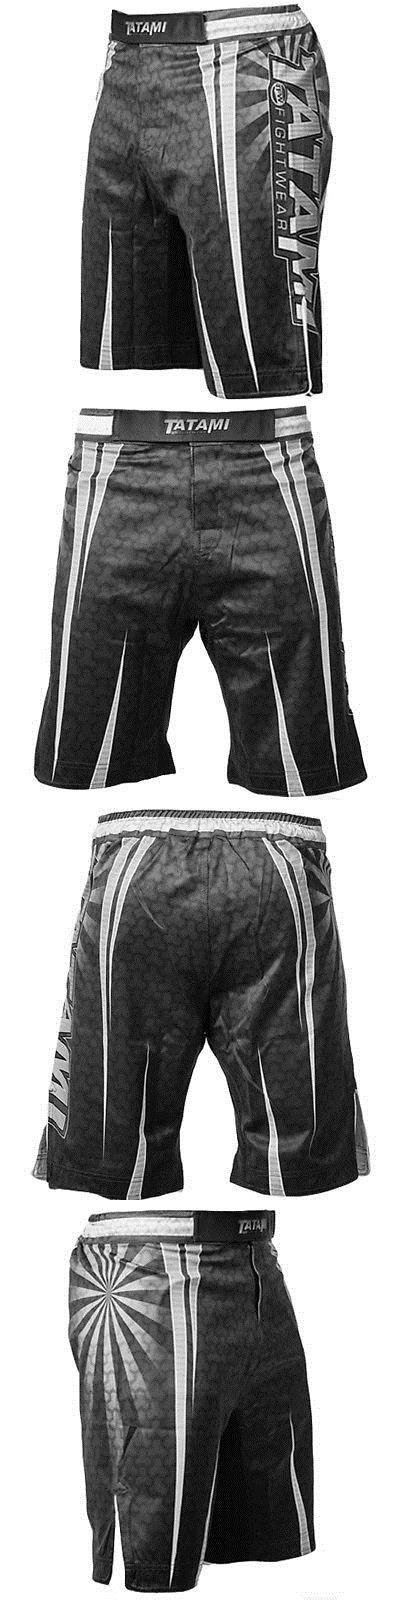 Shorts 73982: Tatami Fightwear Matrix Mma Fight Shorts - Grey -> BUY IT NOW ONLY: $54.99 on eBay!